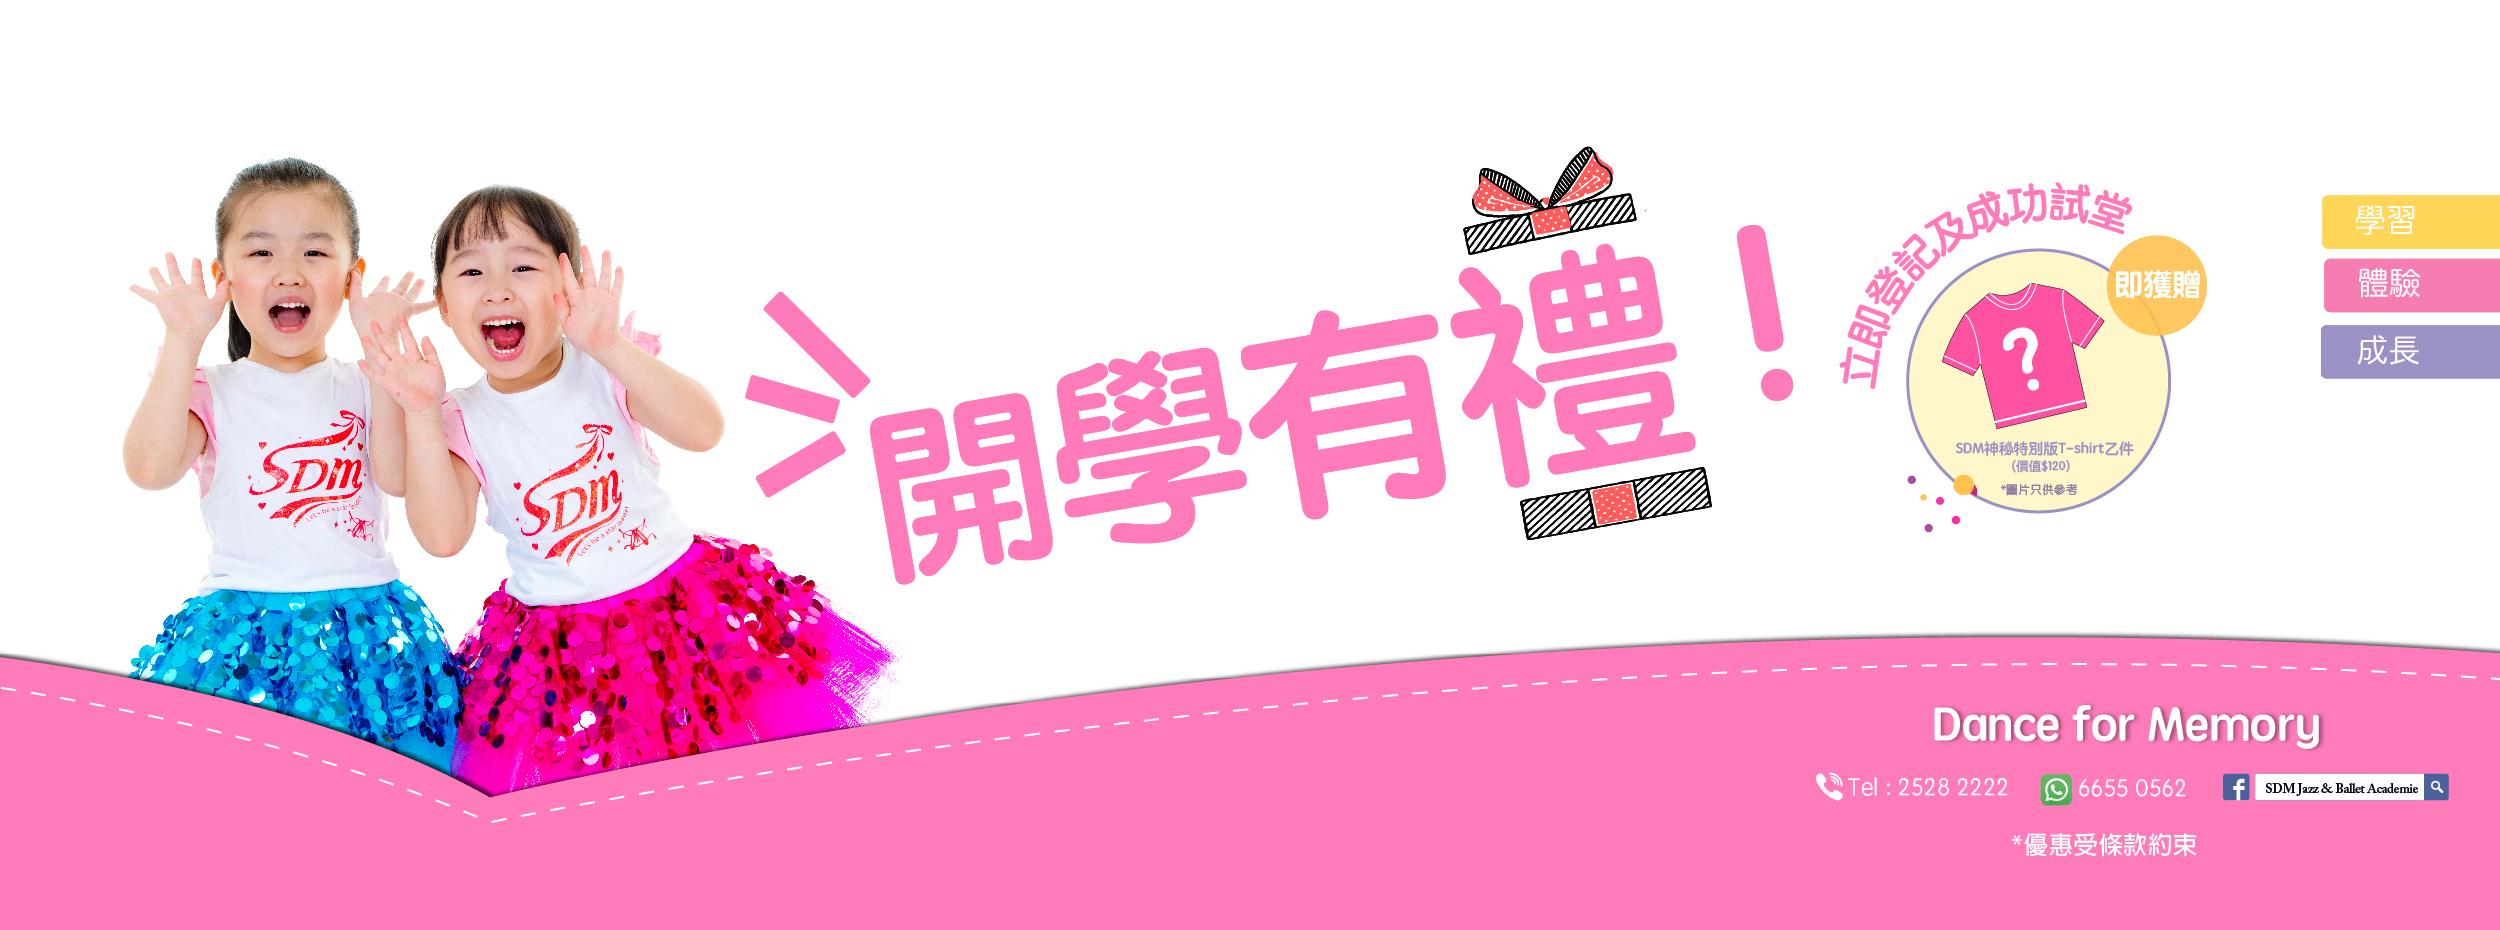 Homepage Banner 2500 x 930_sc_storybook-01